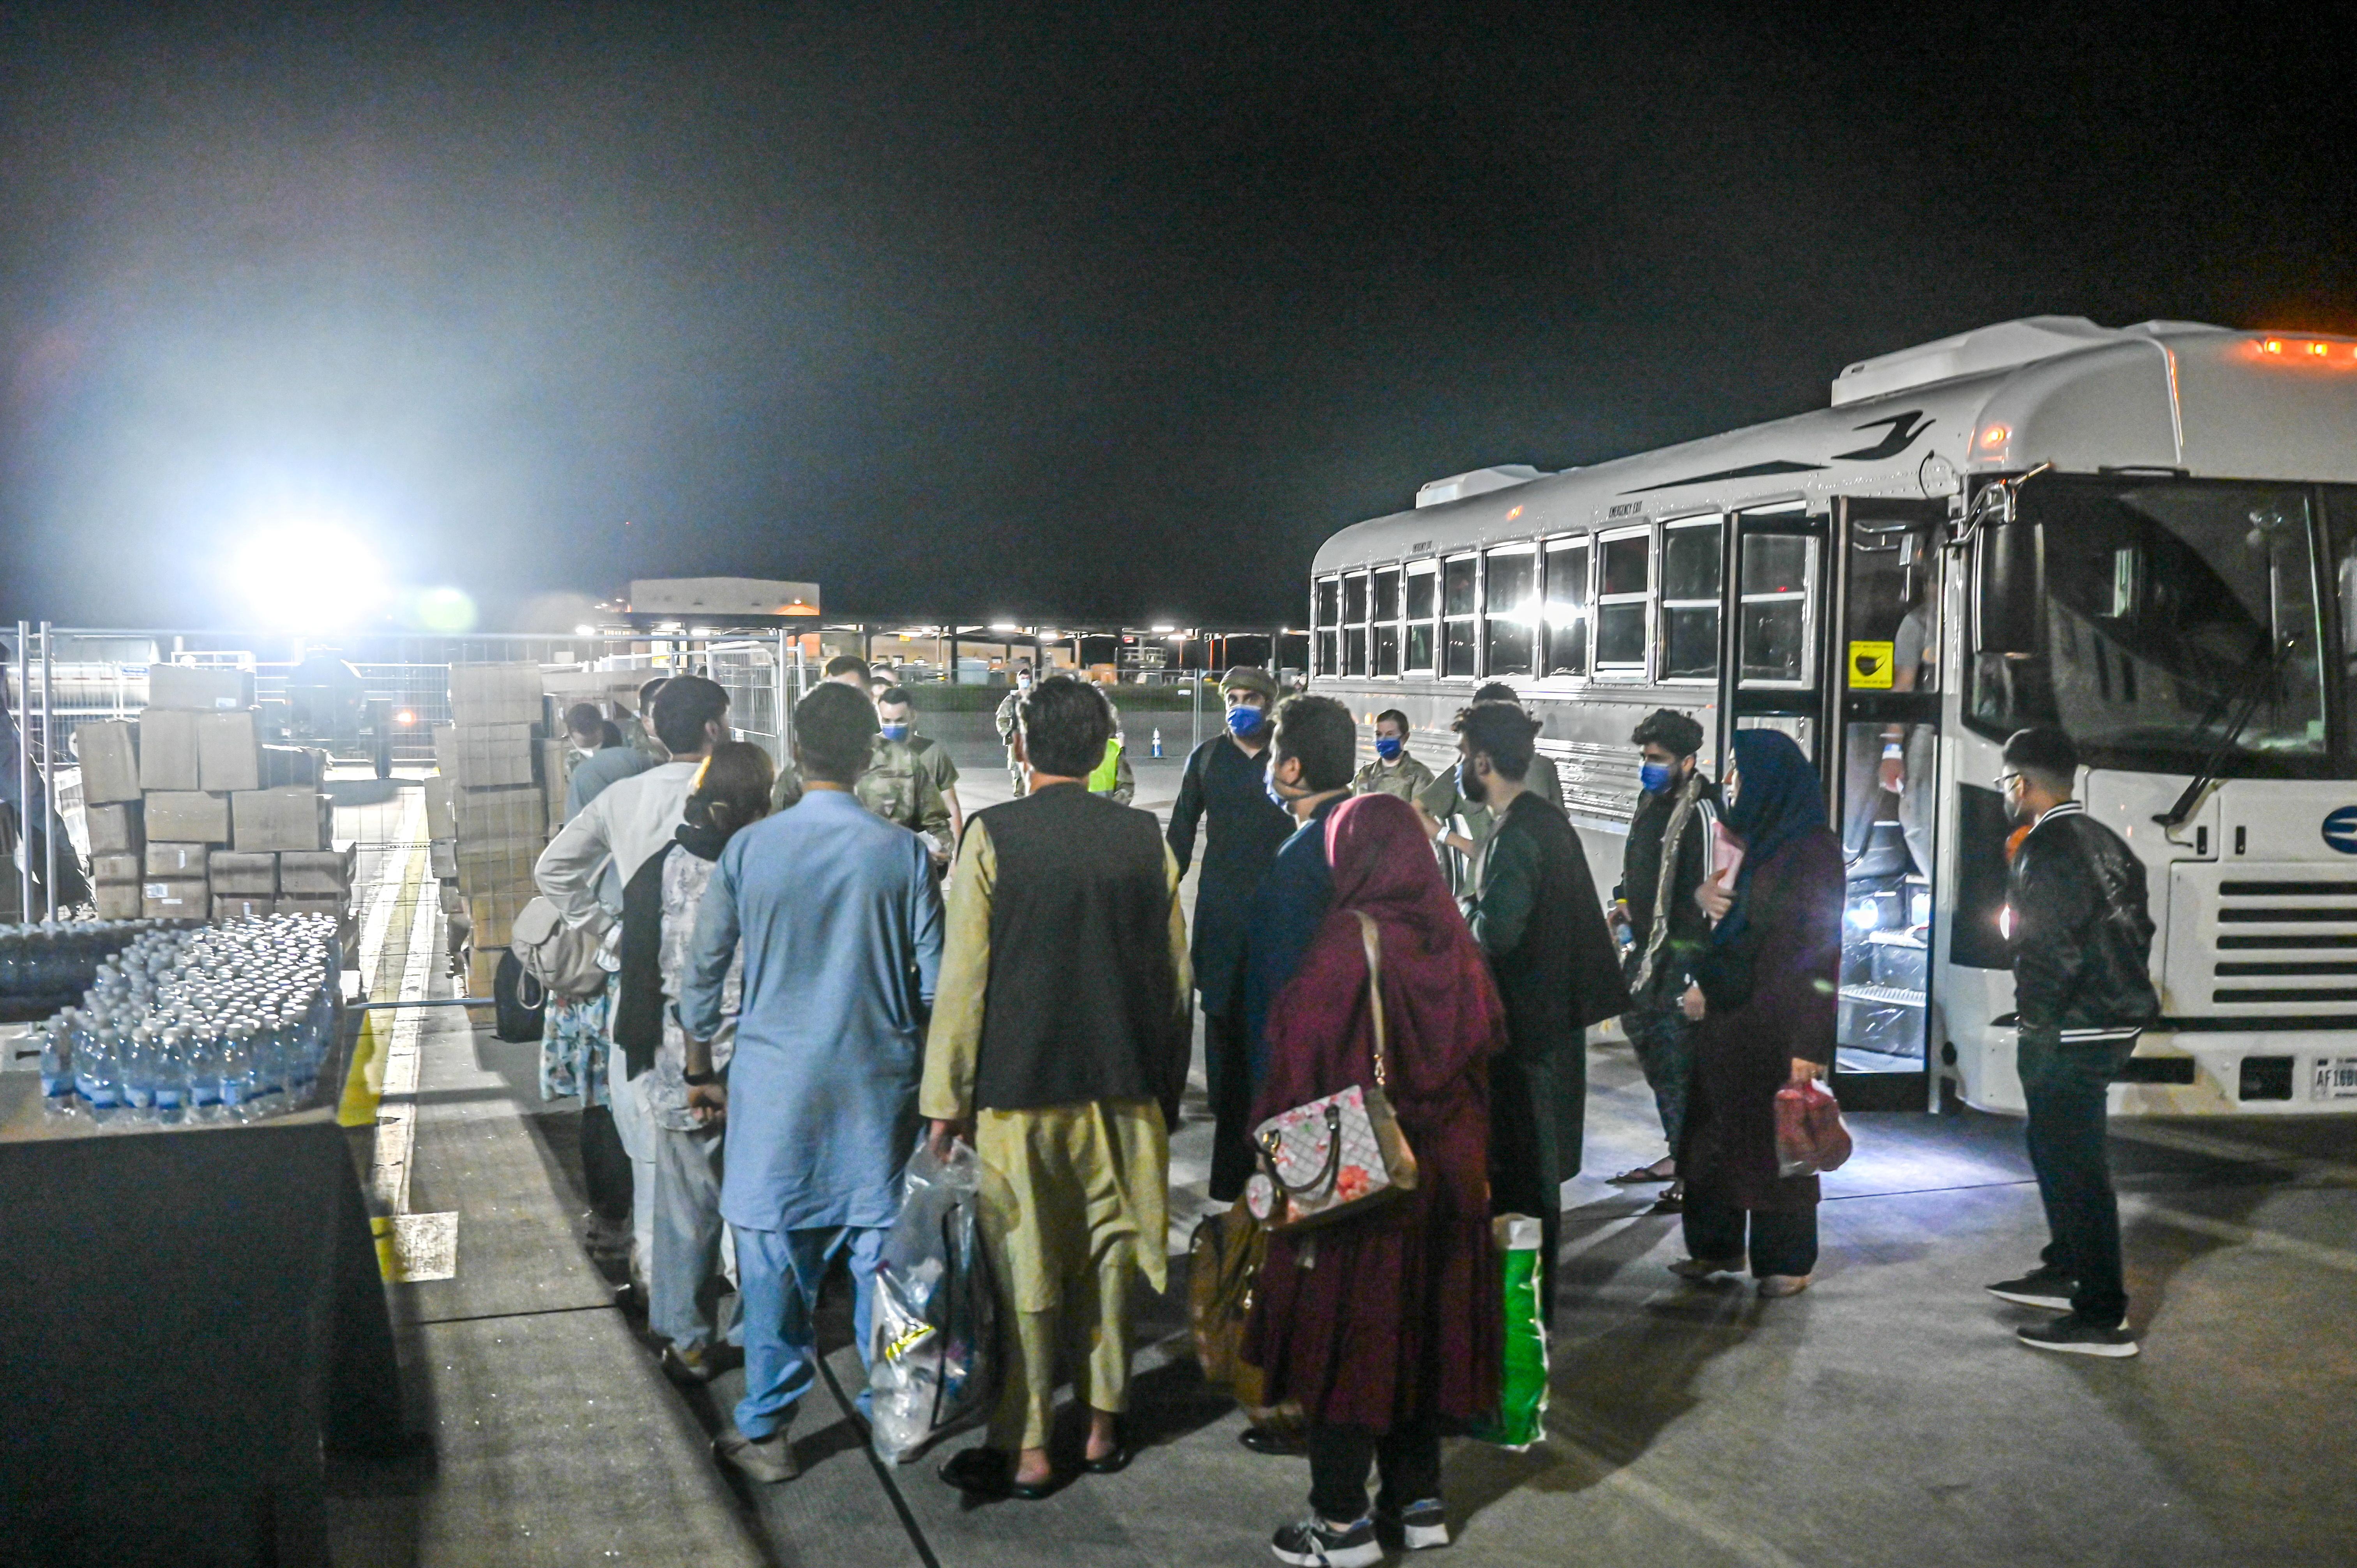 A group of evacuees from Afghanistan depart a bus at Ramstein Air Base, Germany, Augusut 20, 2021. U.S. Air Force/Senior Airman Jan K. Valle/Handout via REUTERS